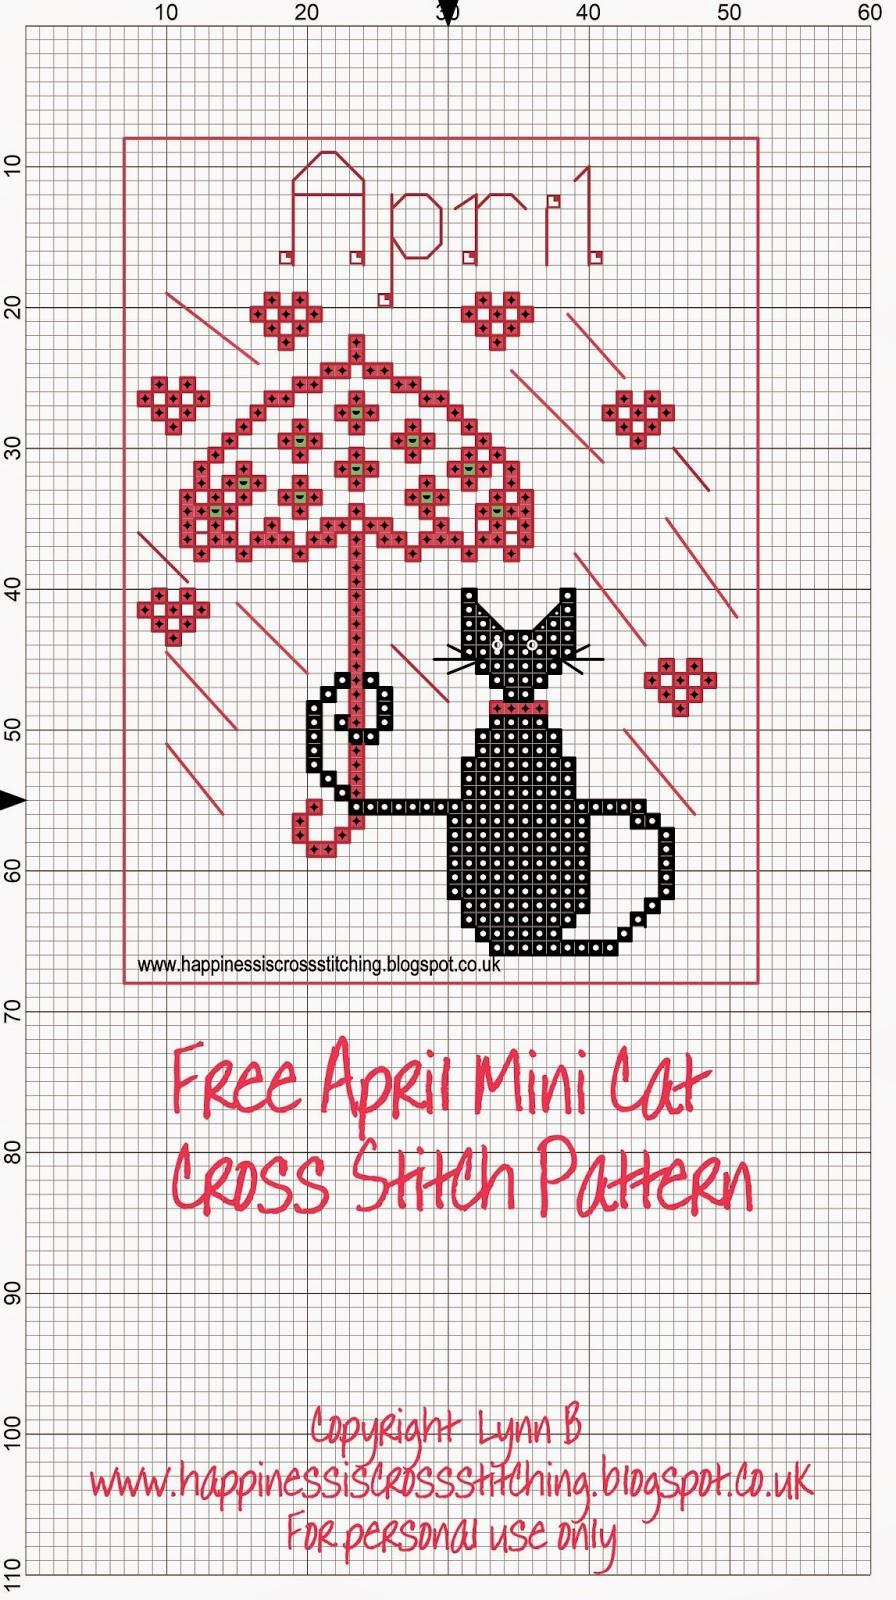 Cross stitch freebies blog